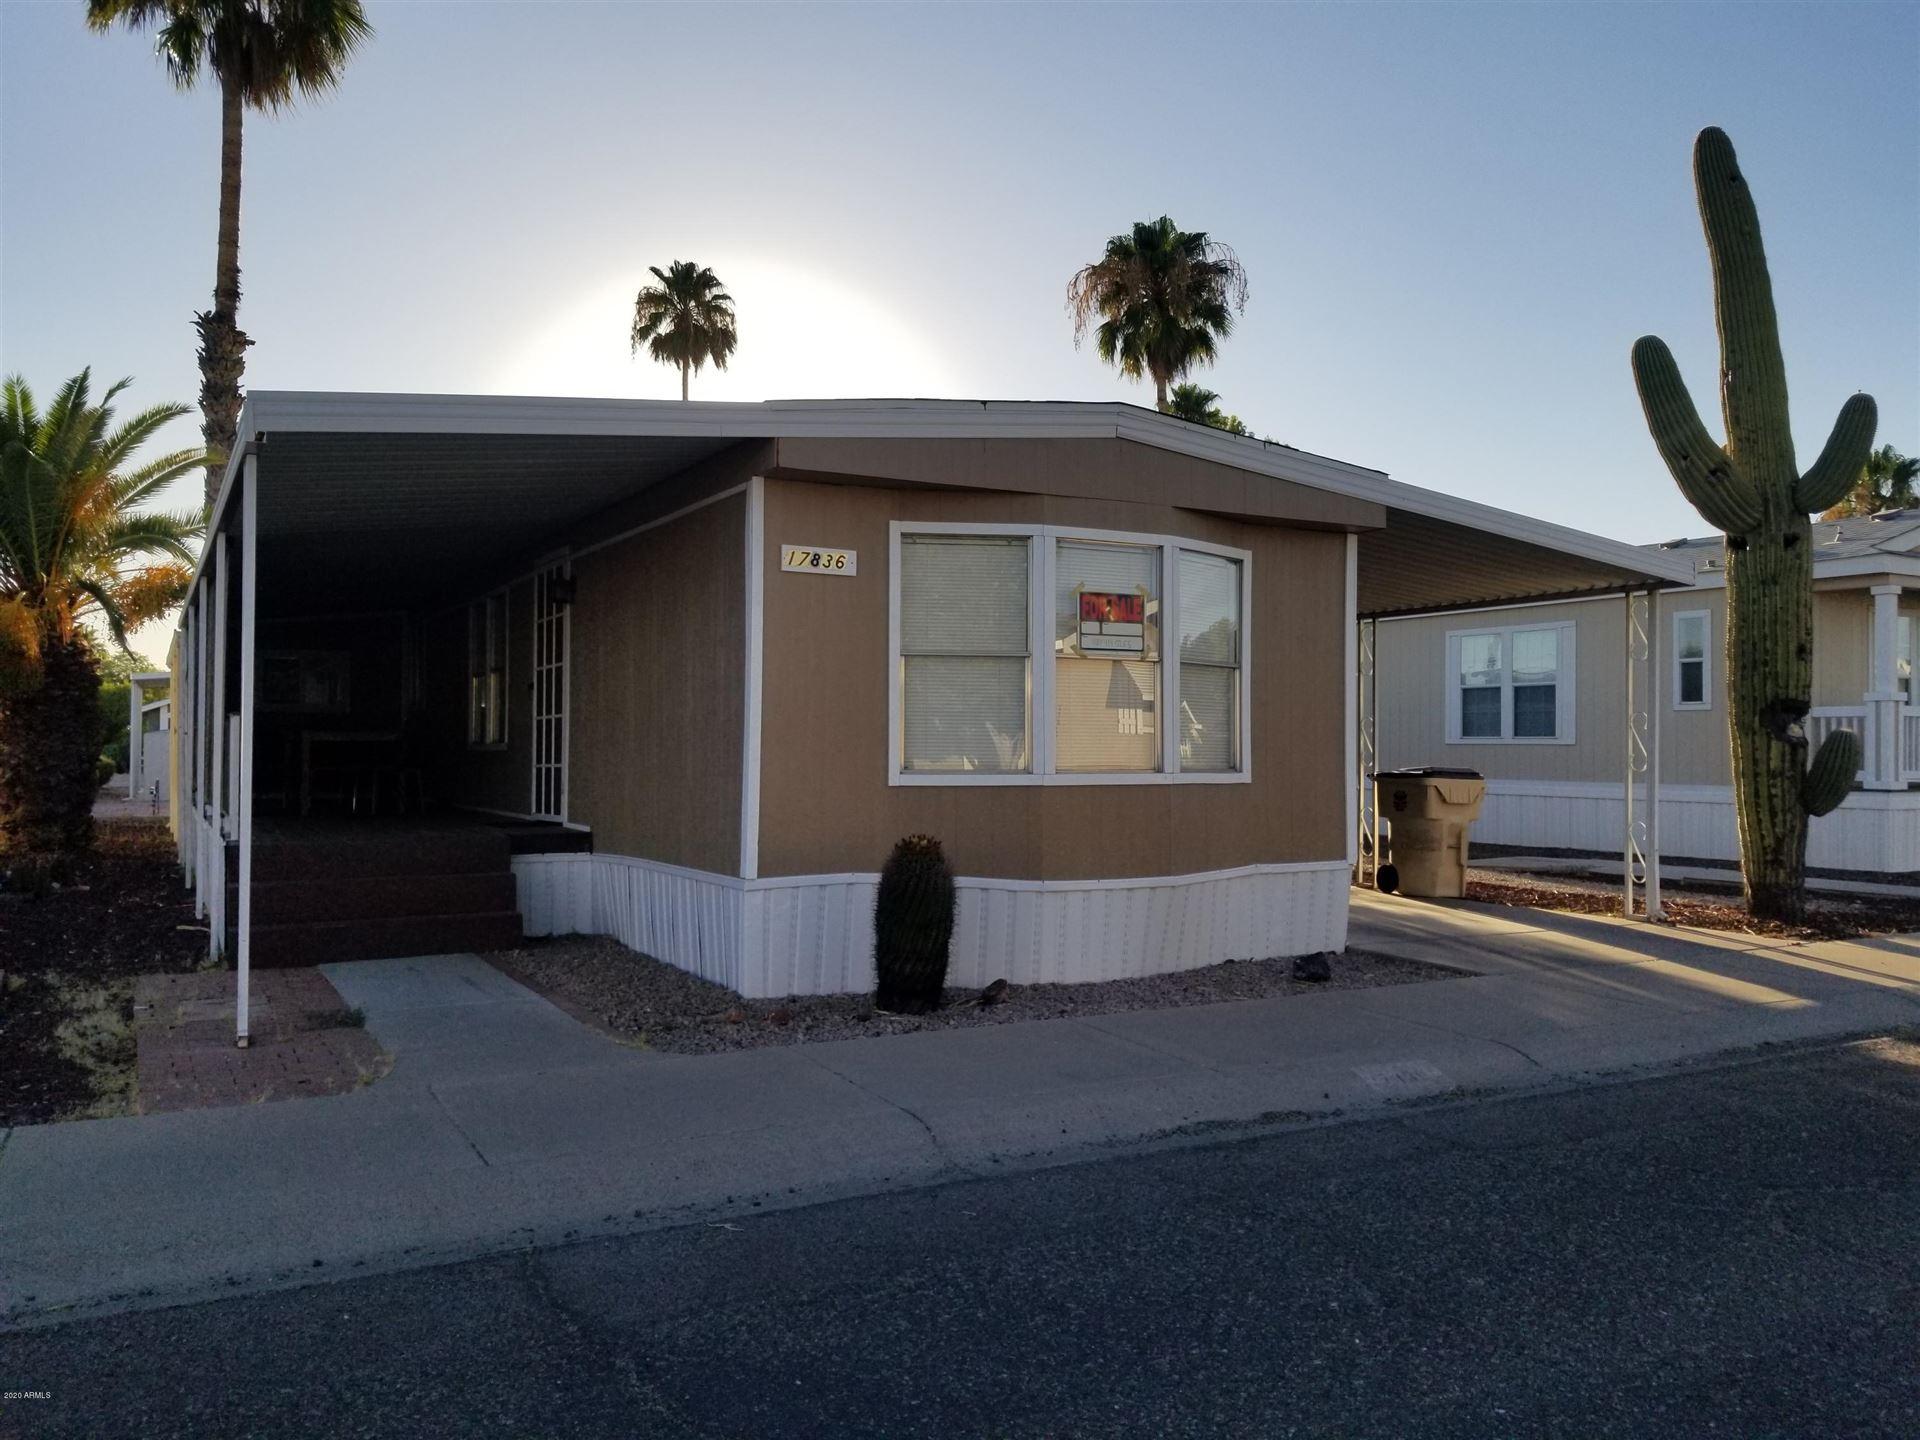 17836 N 17 Place #46, Phoenix, AZ 85022 - MLS#: 6106530